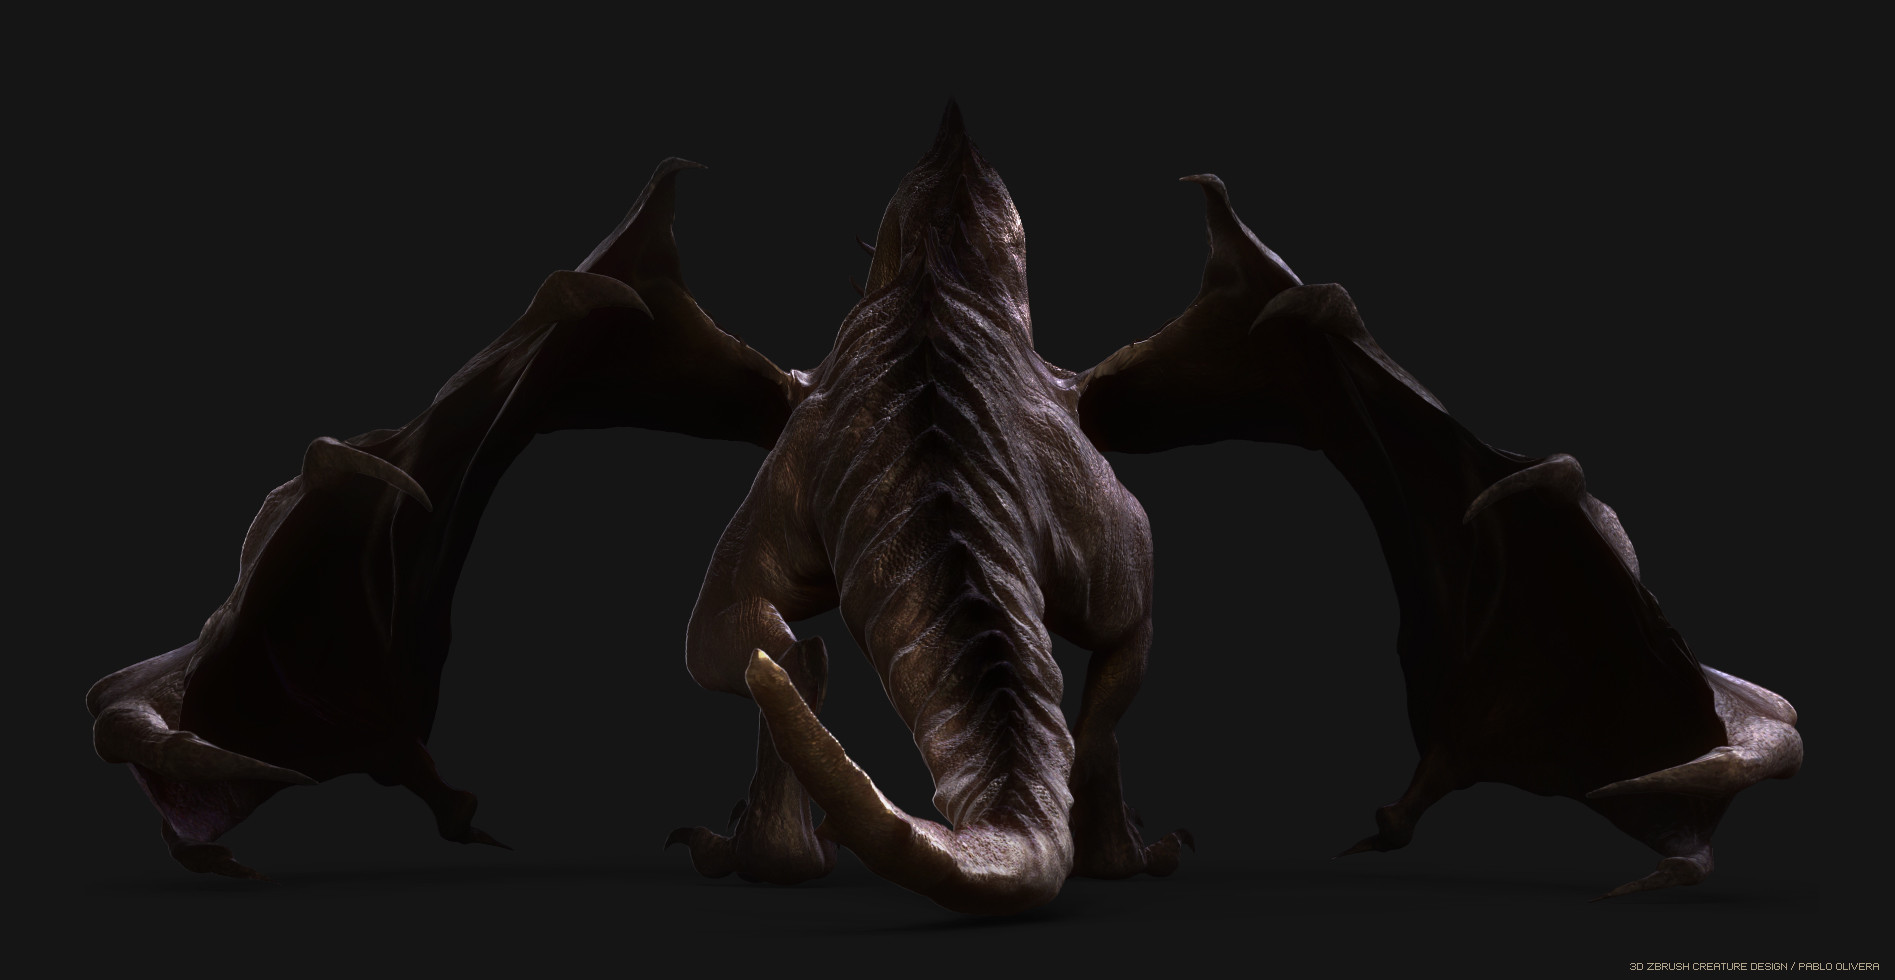 Pablo olivera dragon zbrush pablo olivera render 360 02